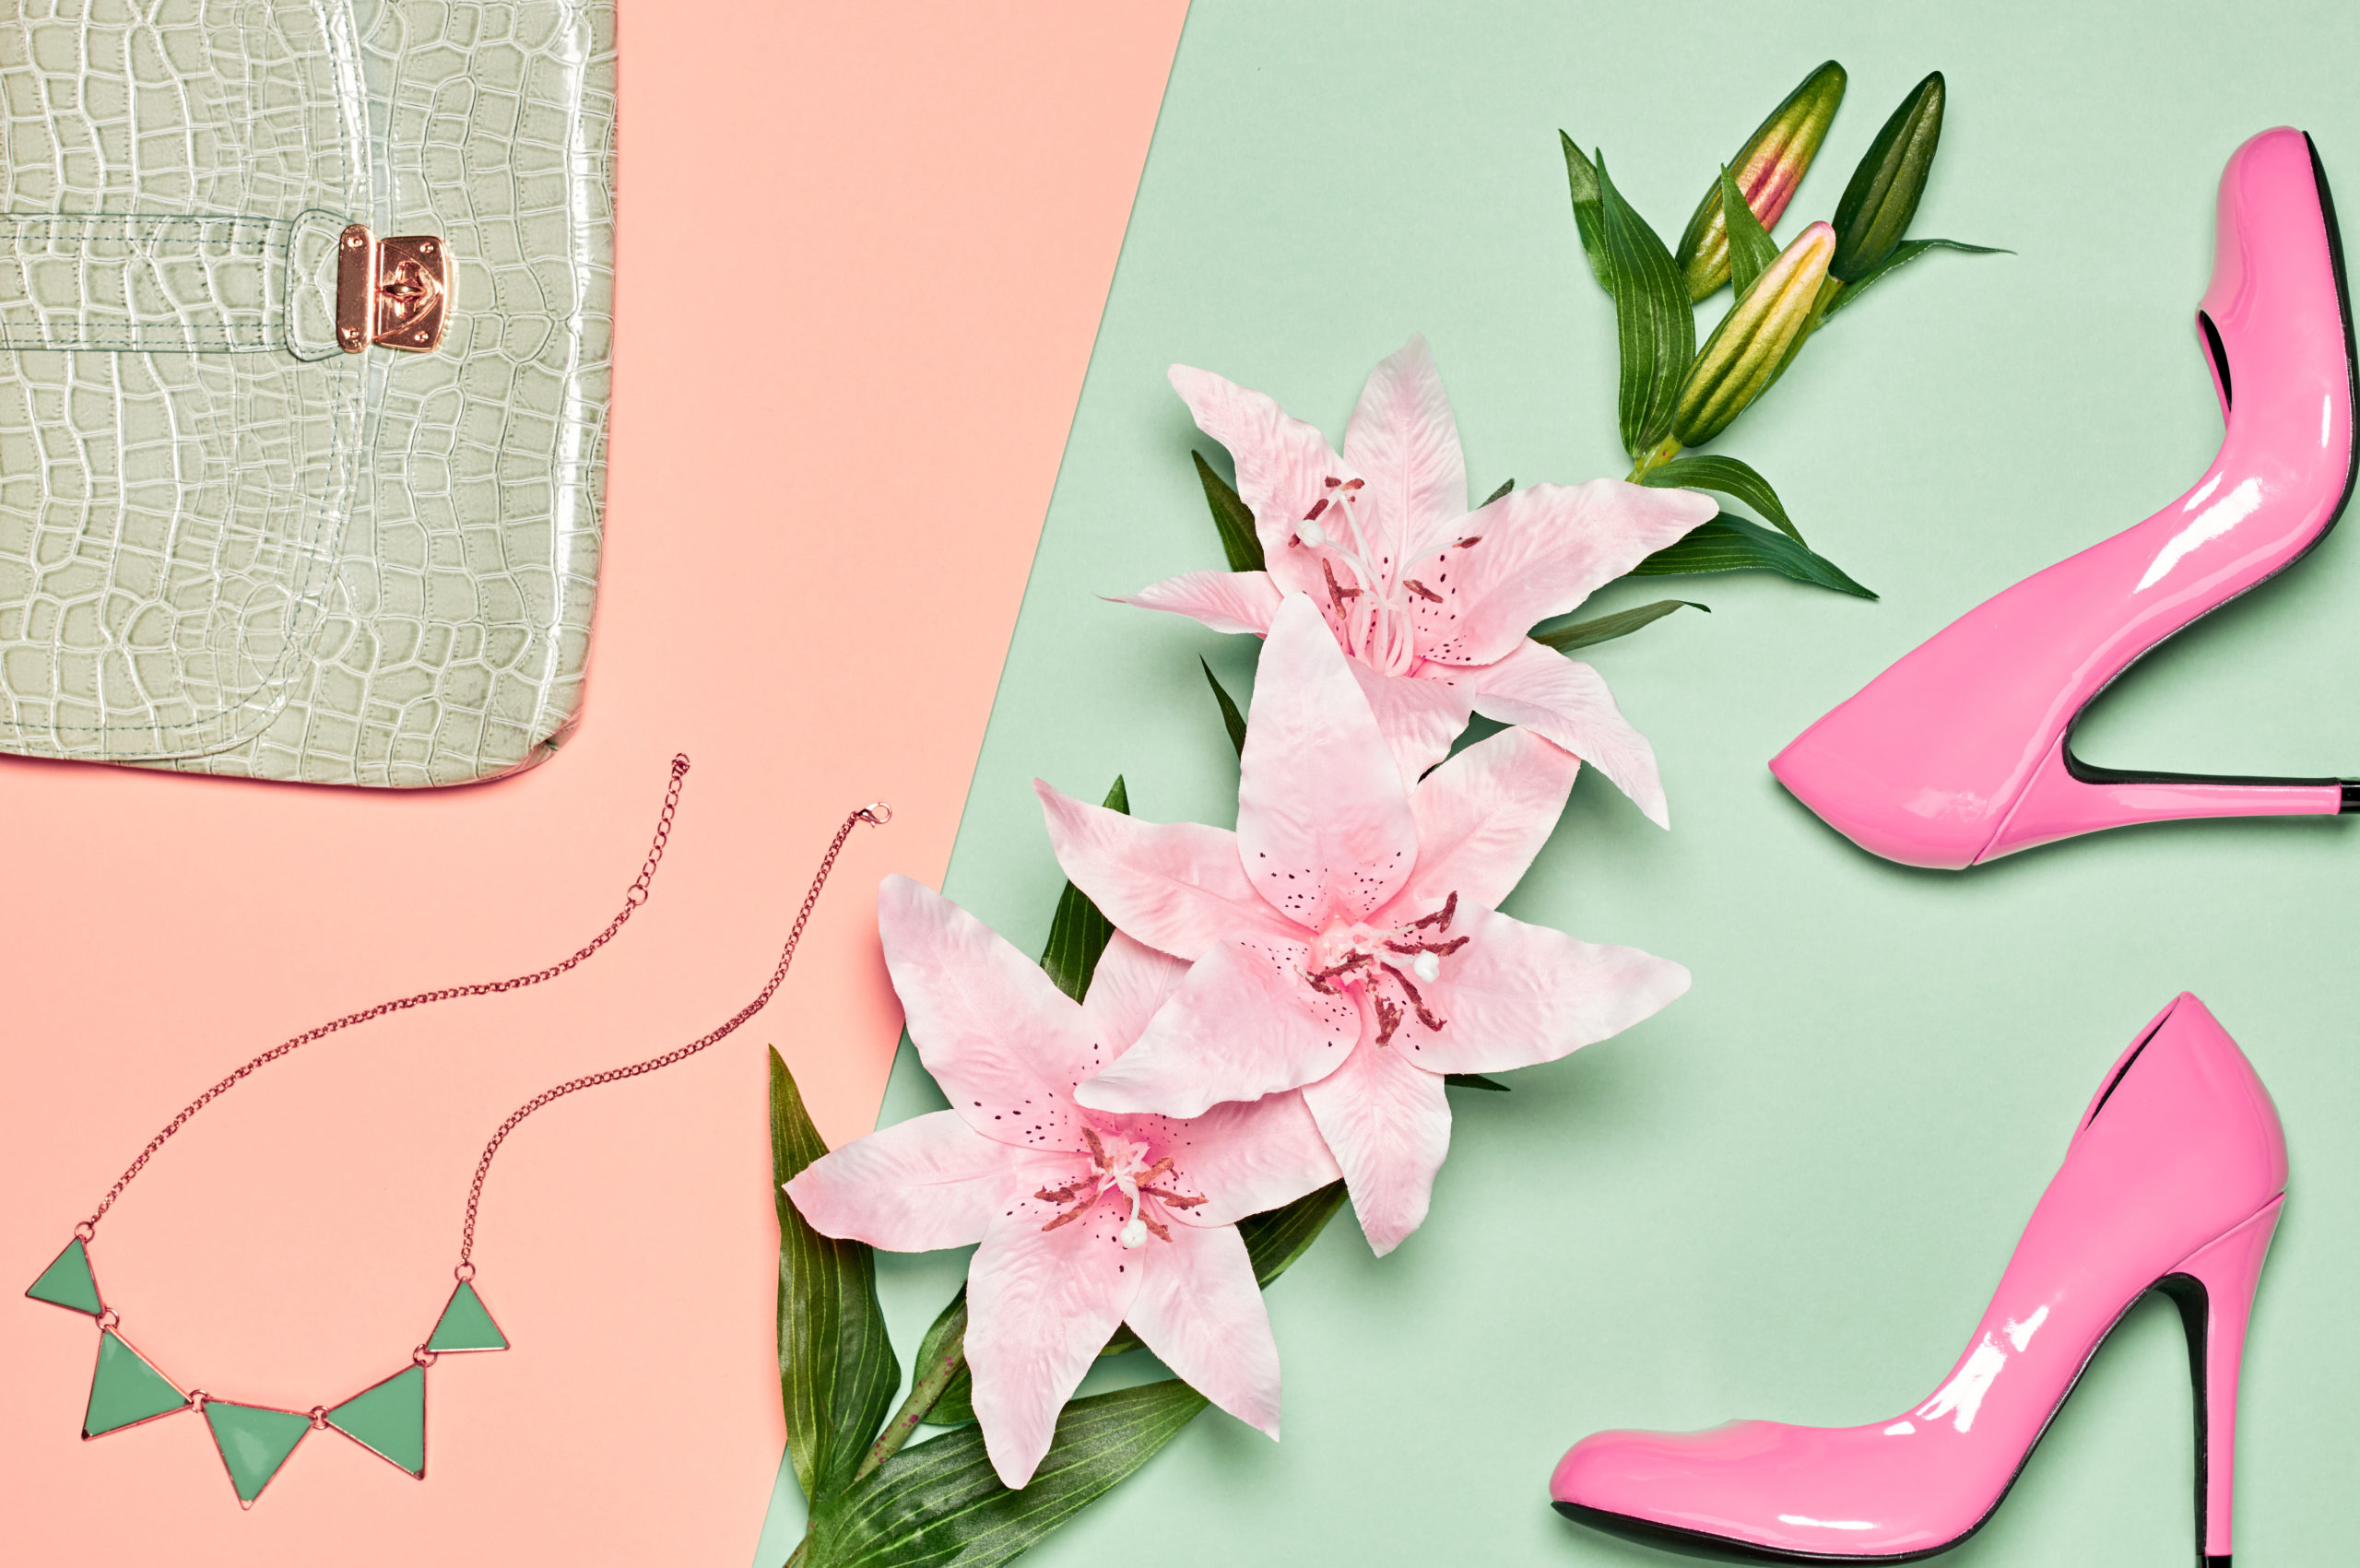 Fashion,Woman,Accessories,Summer,Set.,Glamor,Heels,,Stylish,Handbag,Clutch,